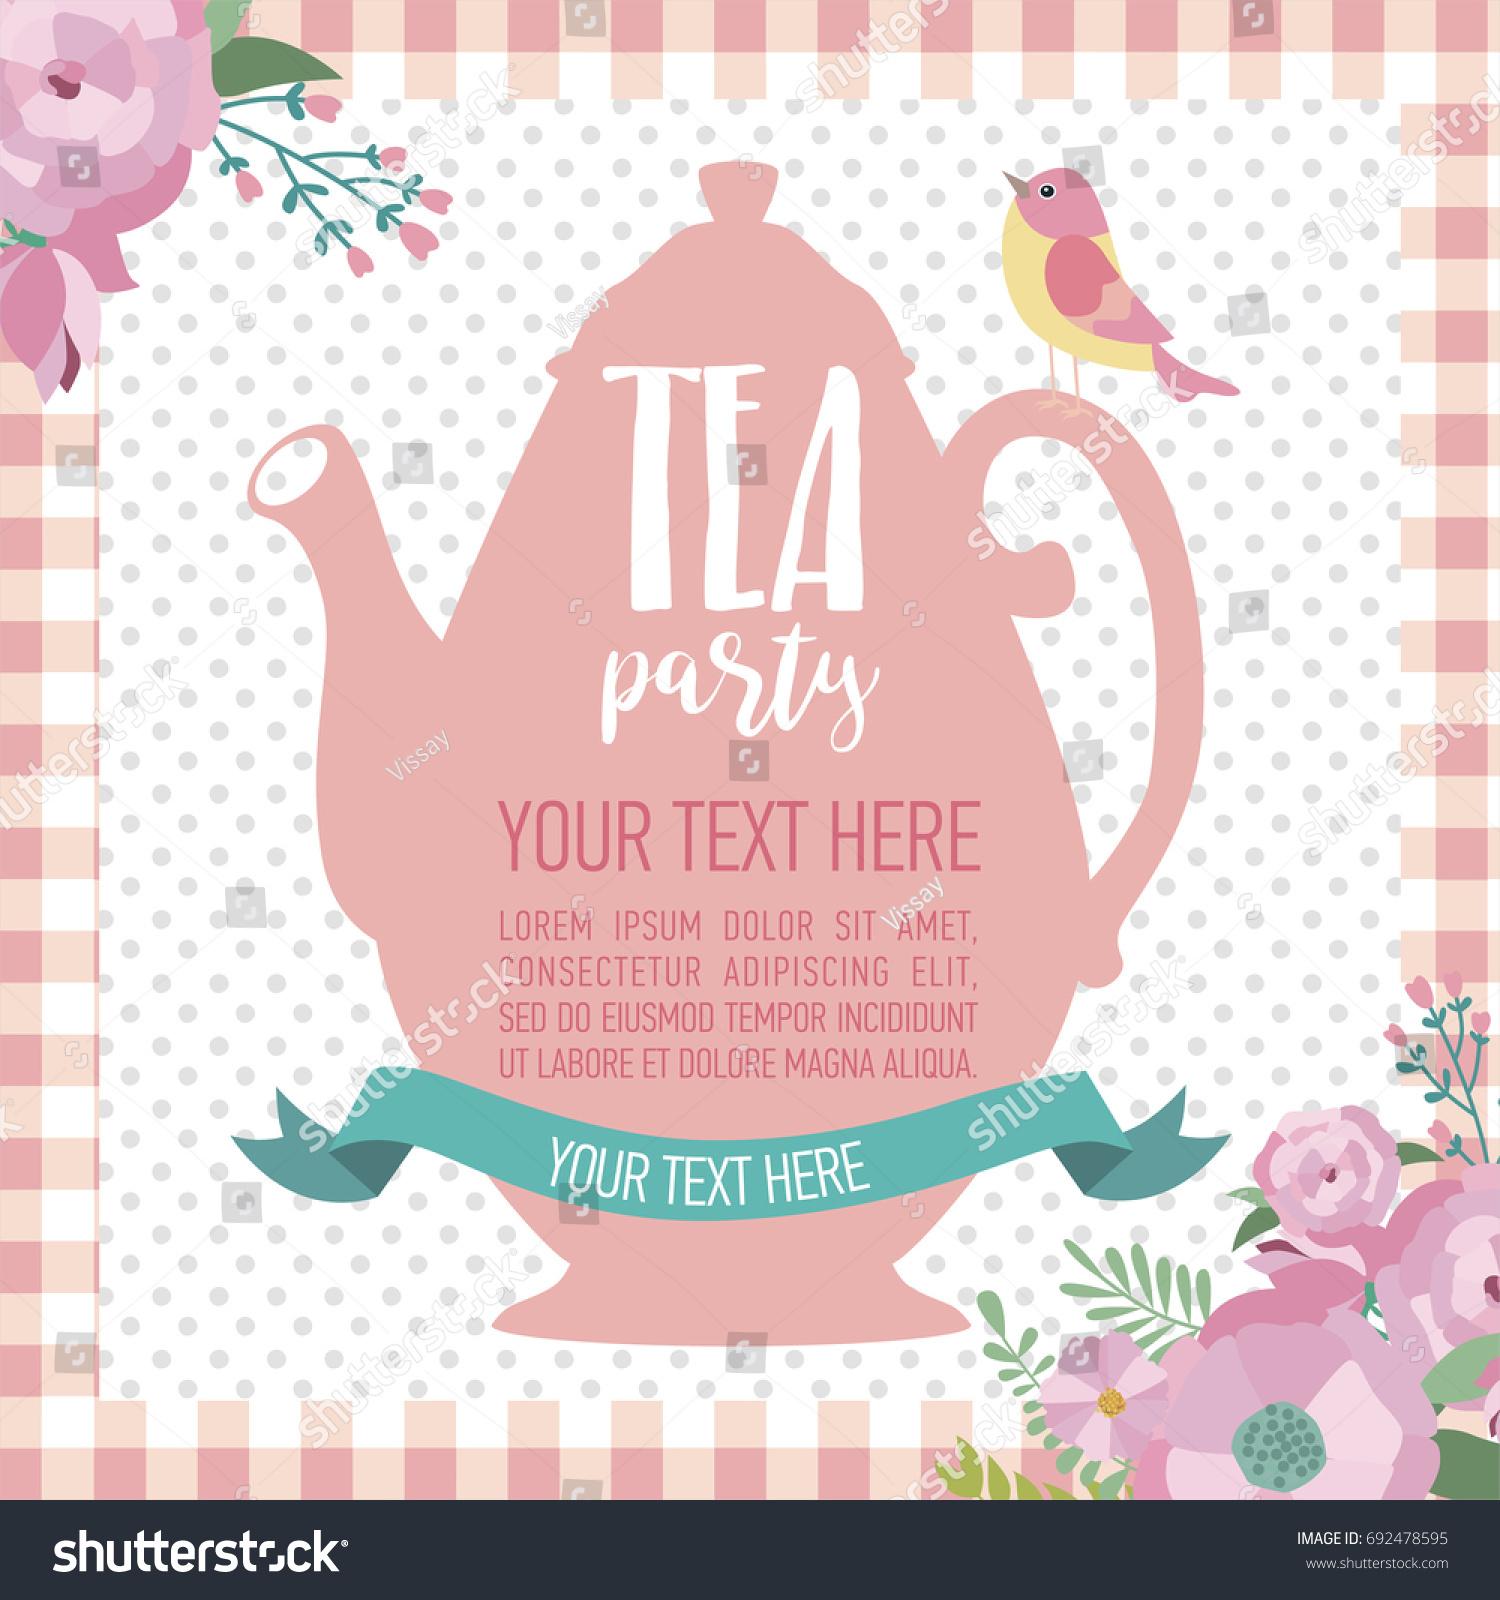 Tea Party Invitation Card Vector Illustration Stock Vector ...